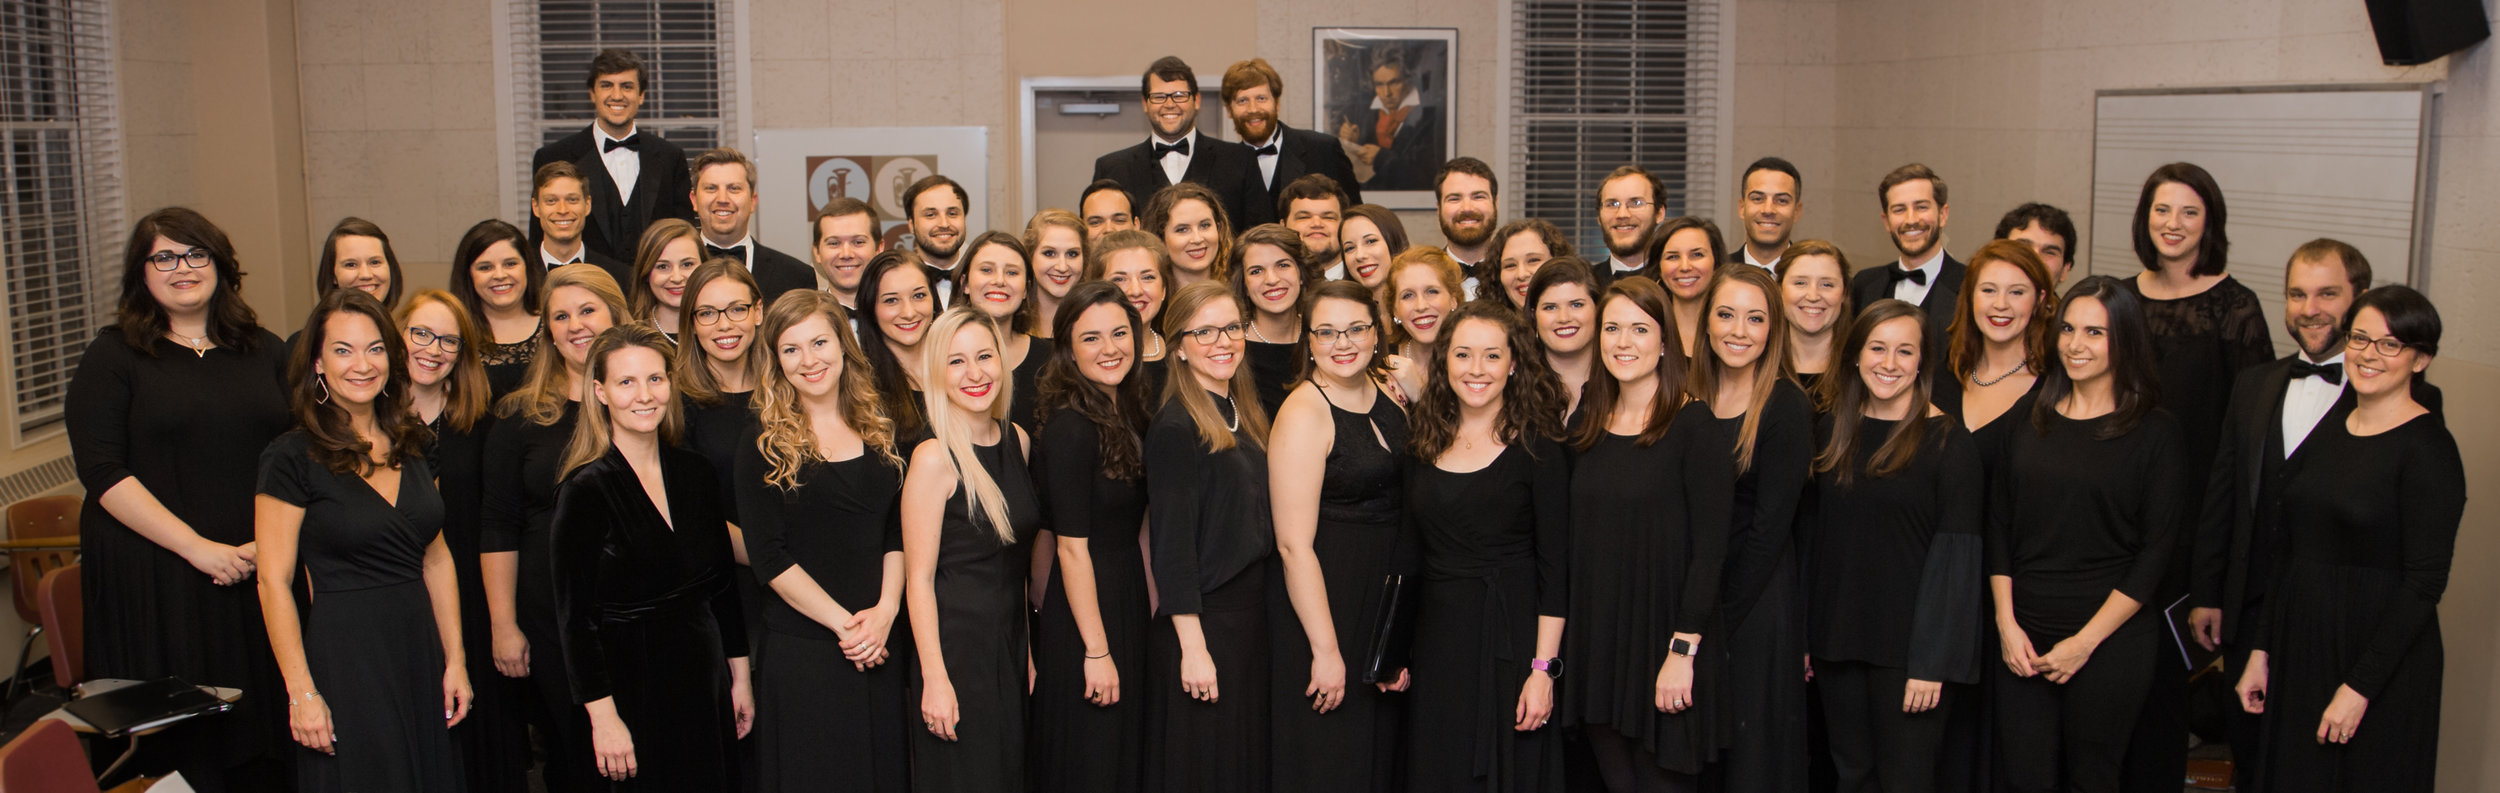 Presbyterian College Choir Alumni before the 2017 Christmas at PC! performance.